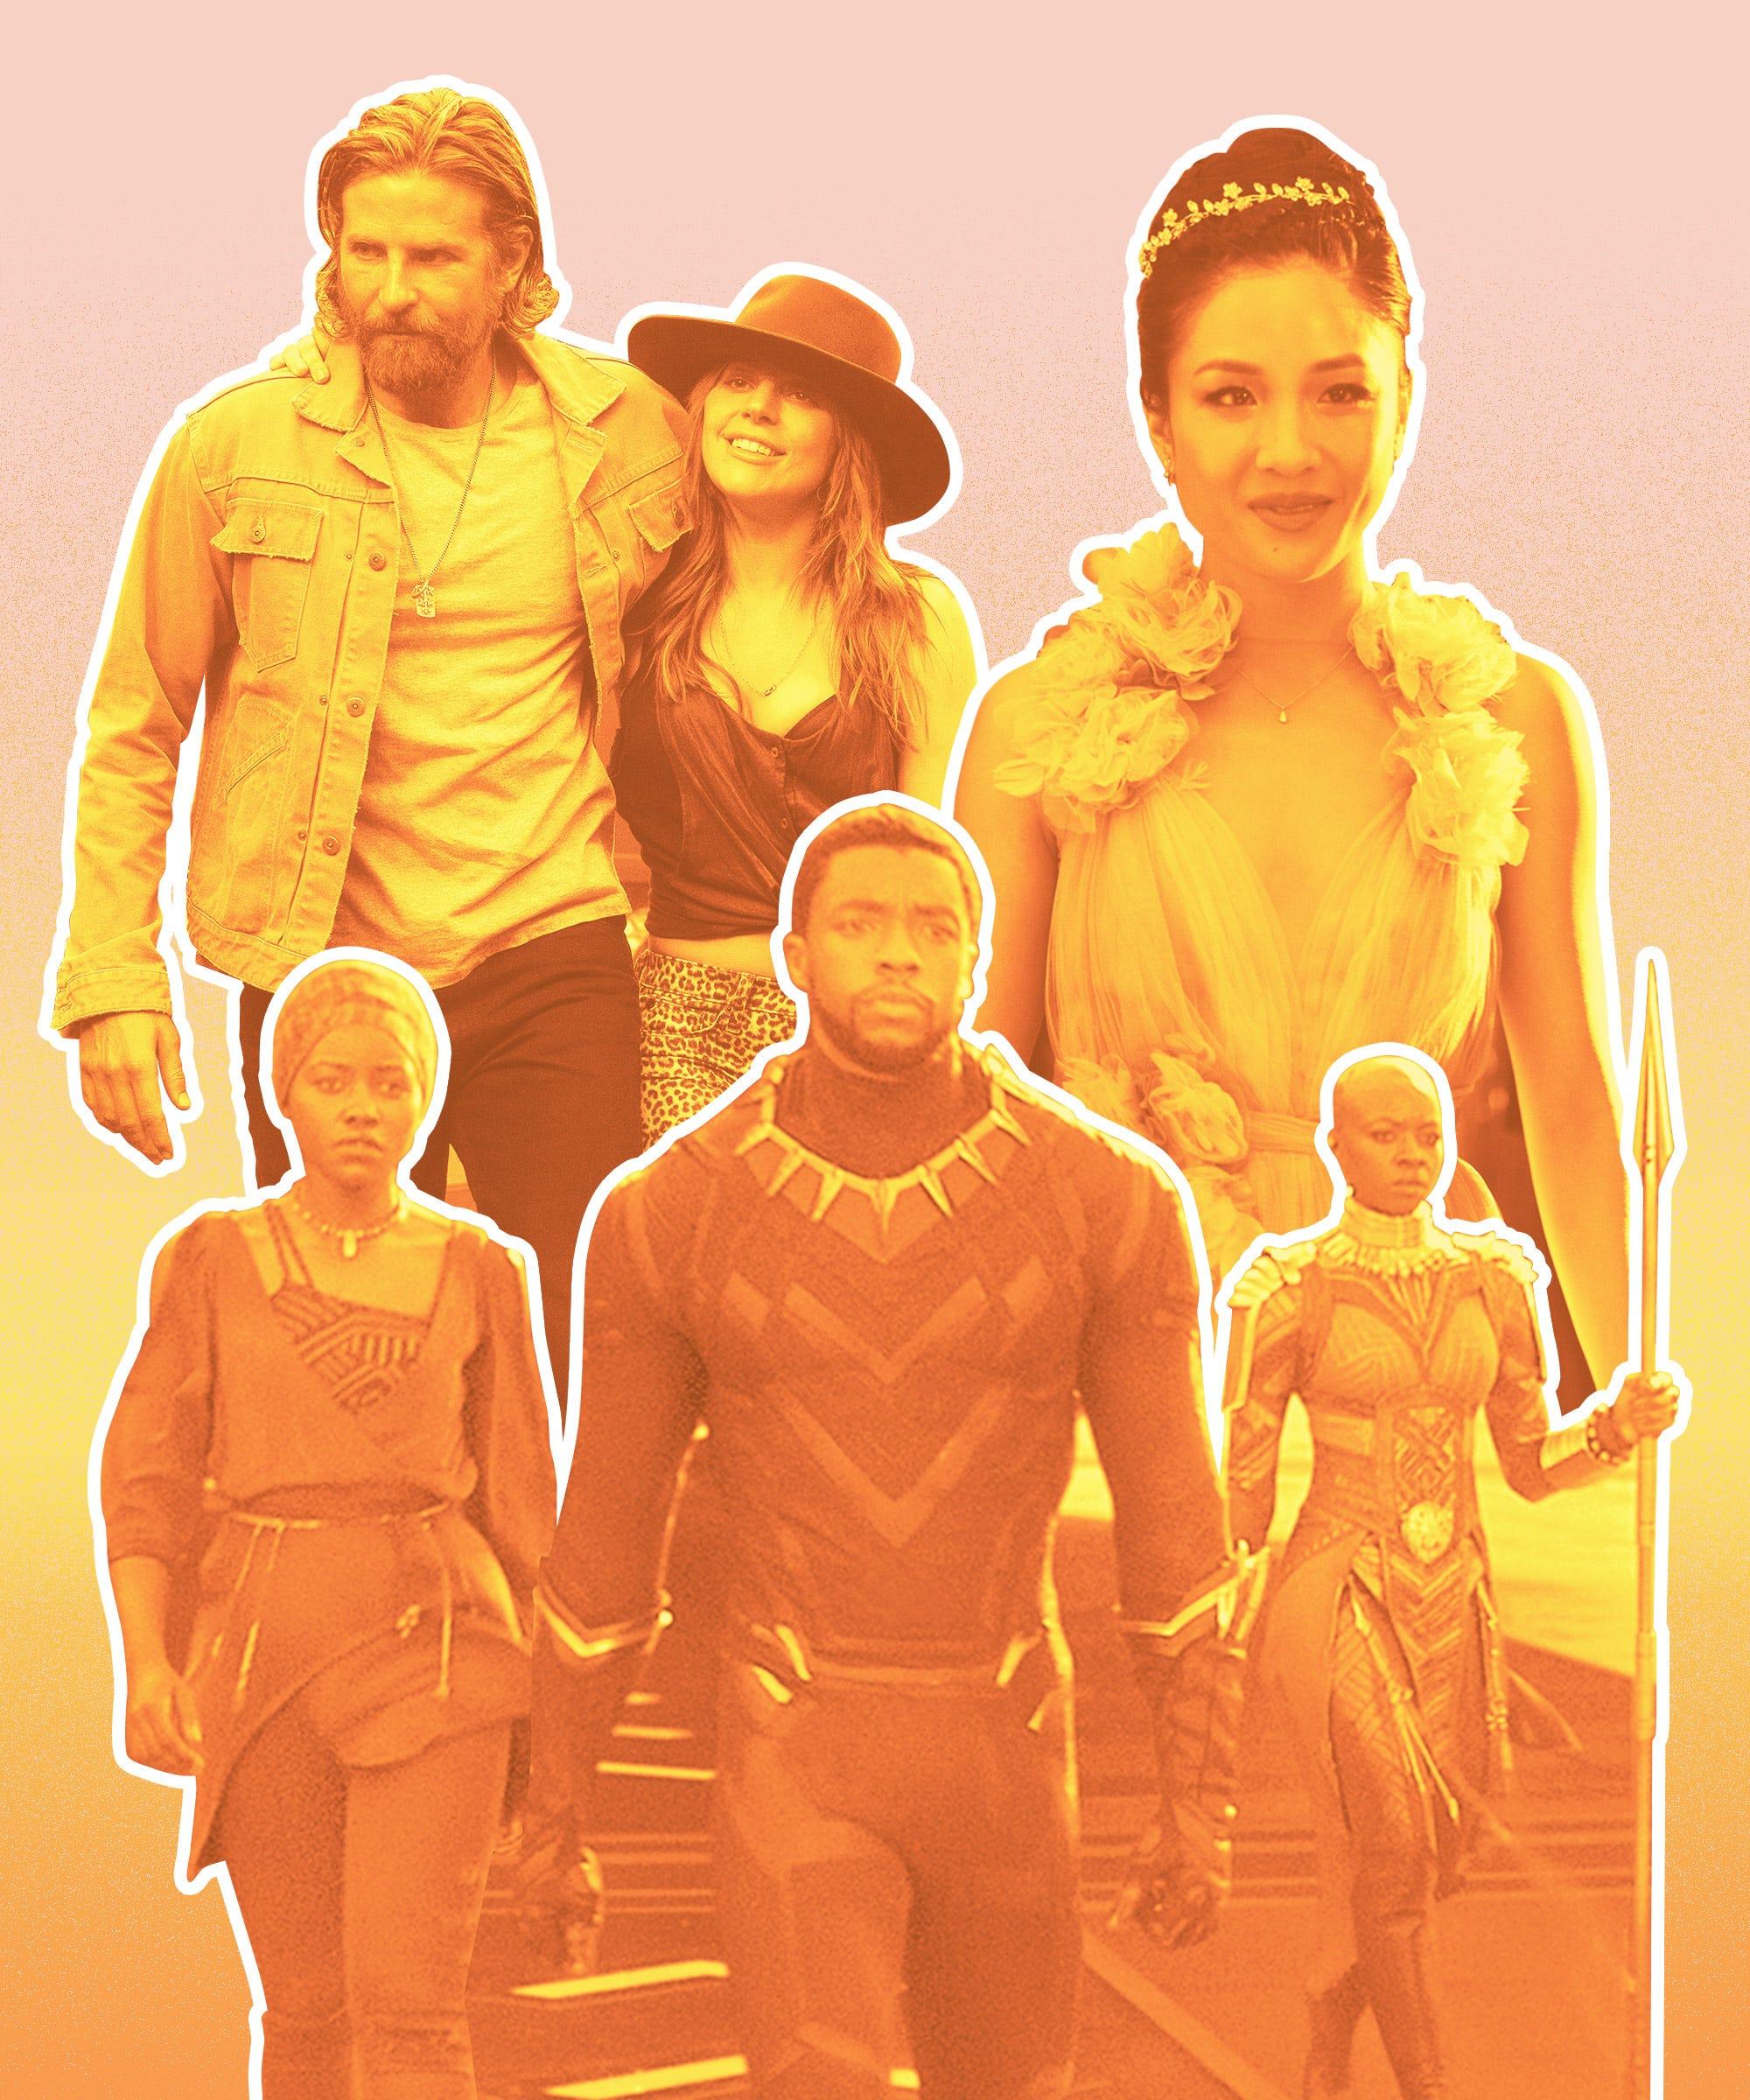 84b6fc077f4 Best Movies So Far 2018 Potential Oscar Films, Reviewed